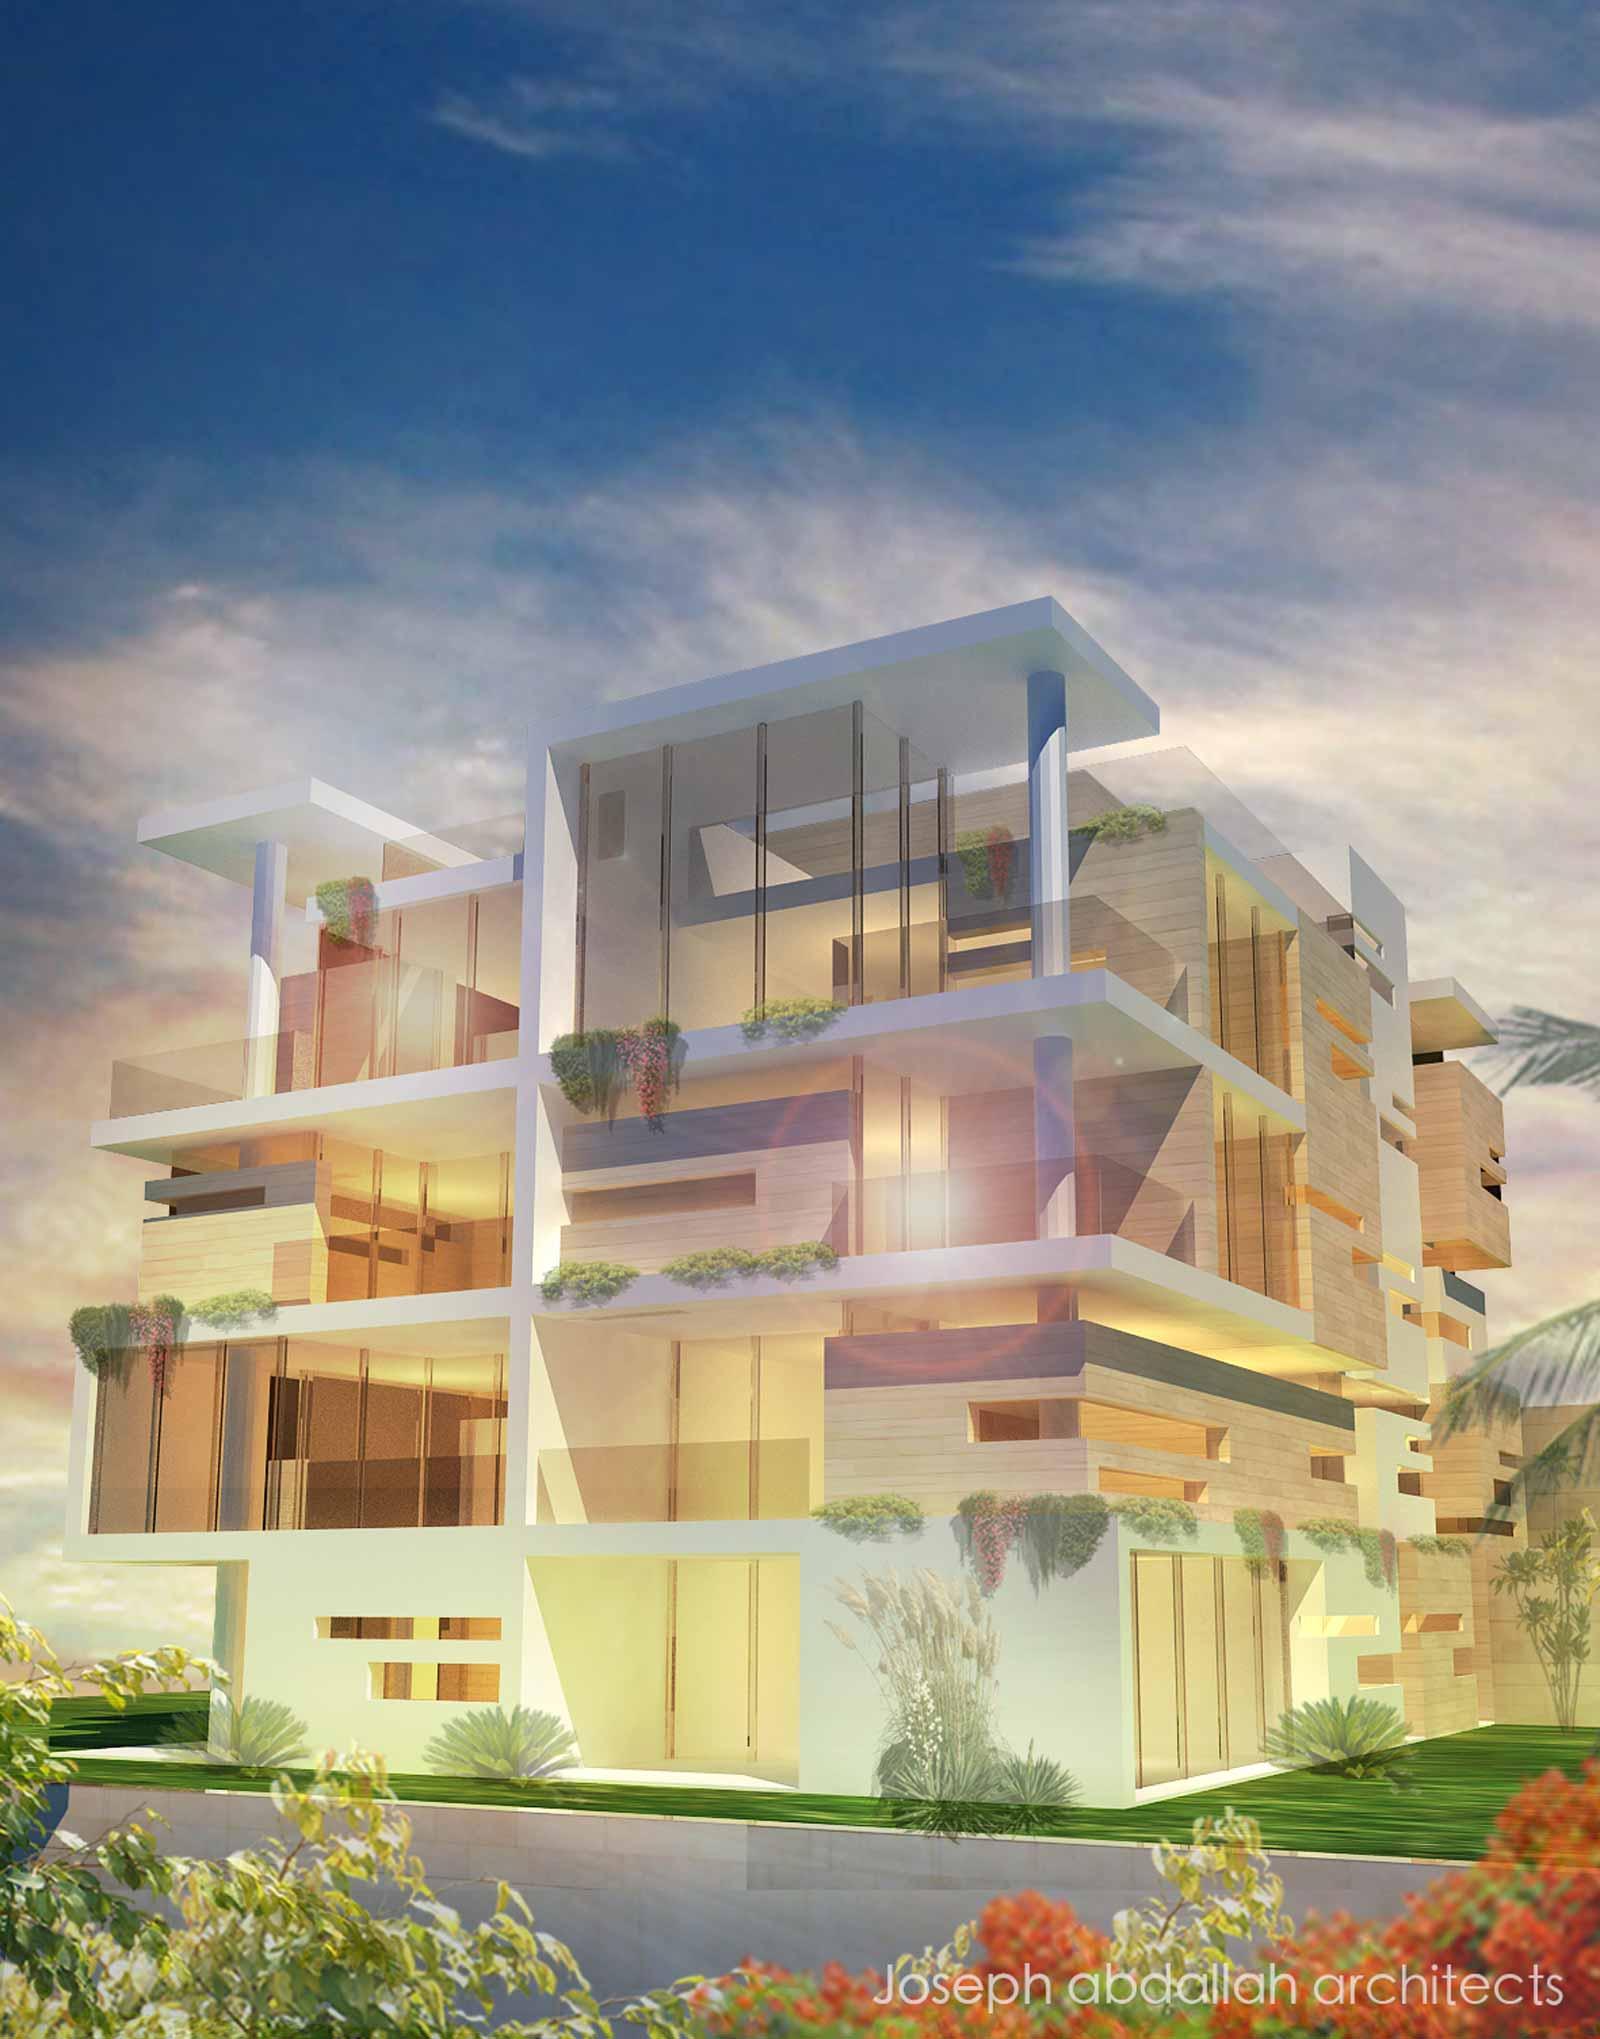 residence-building-modern-architecture-lebanon-joseph-abdallah-architects-2